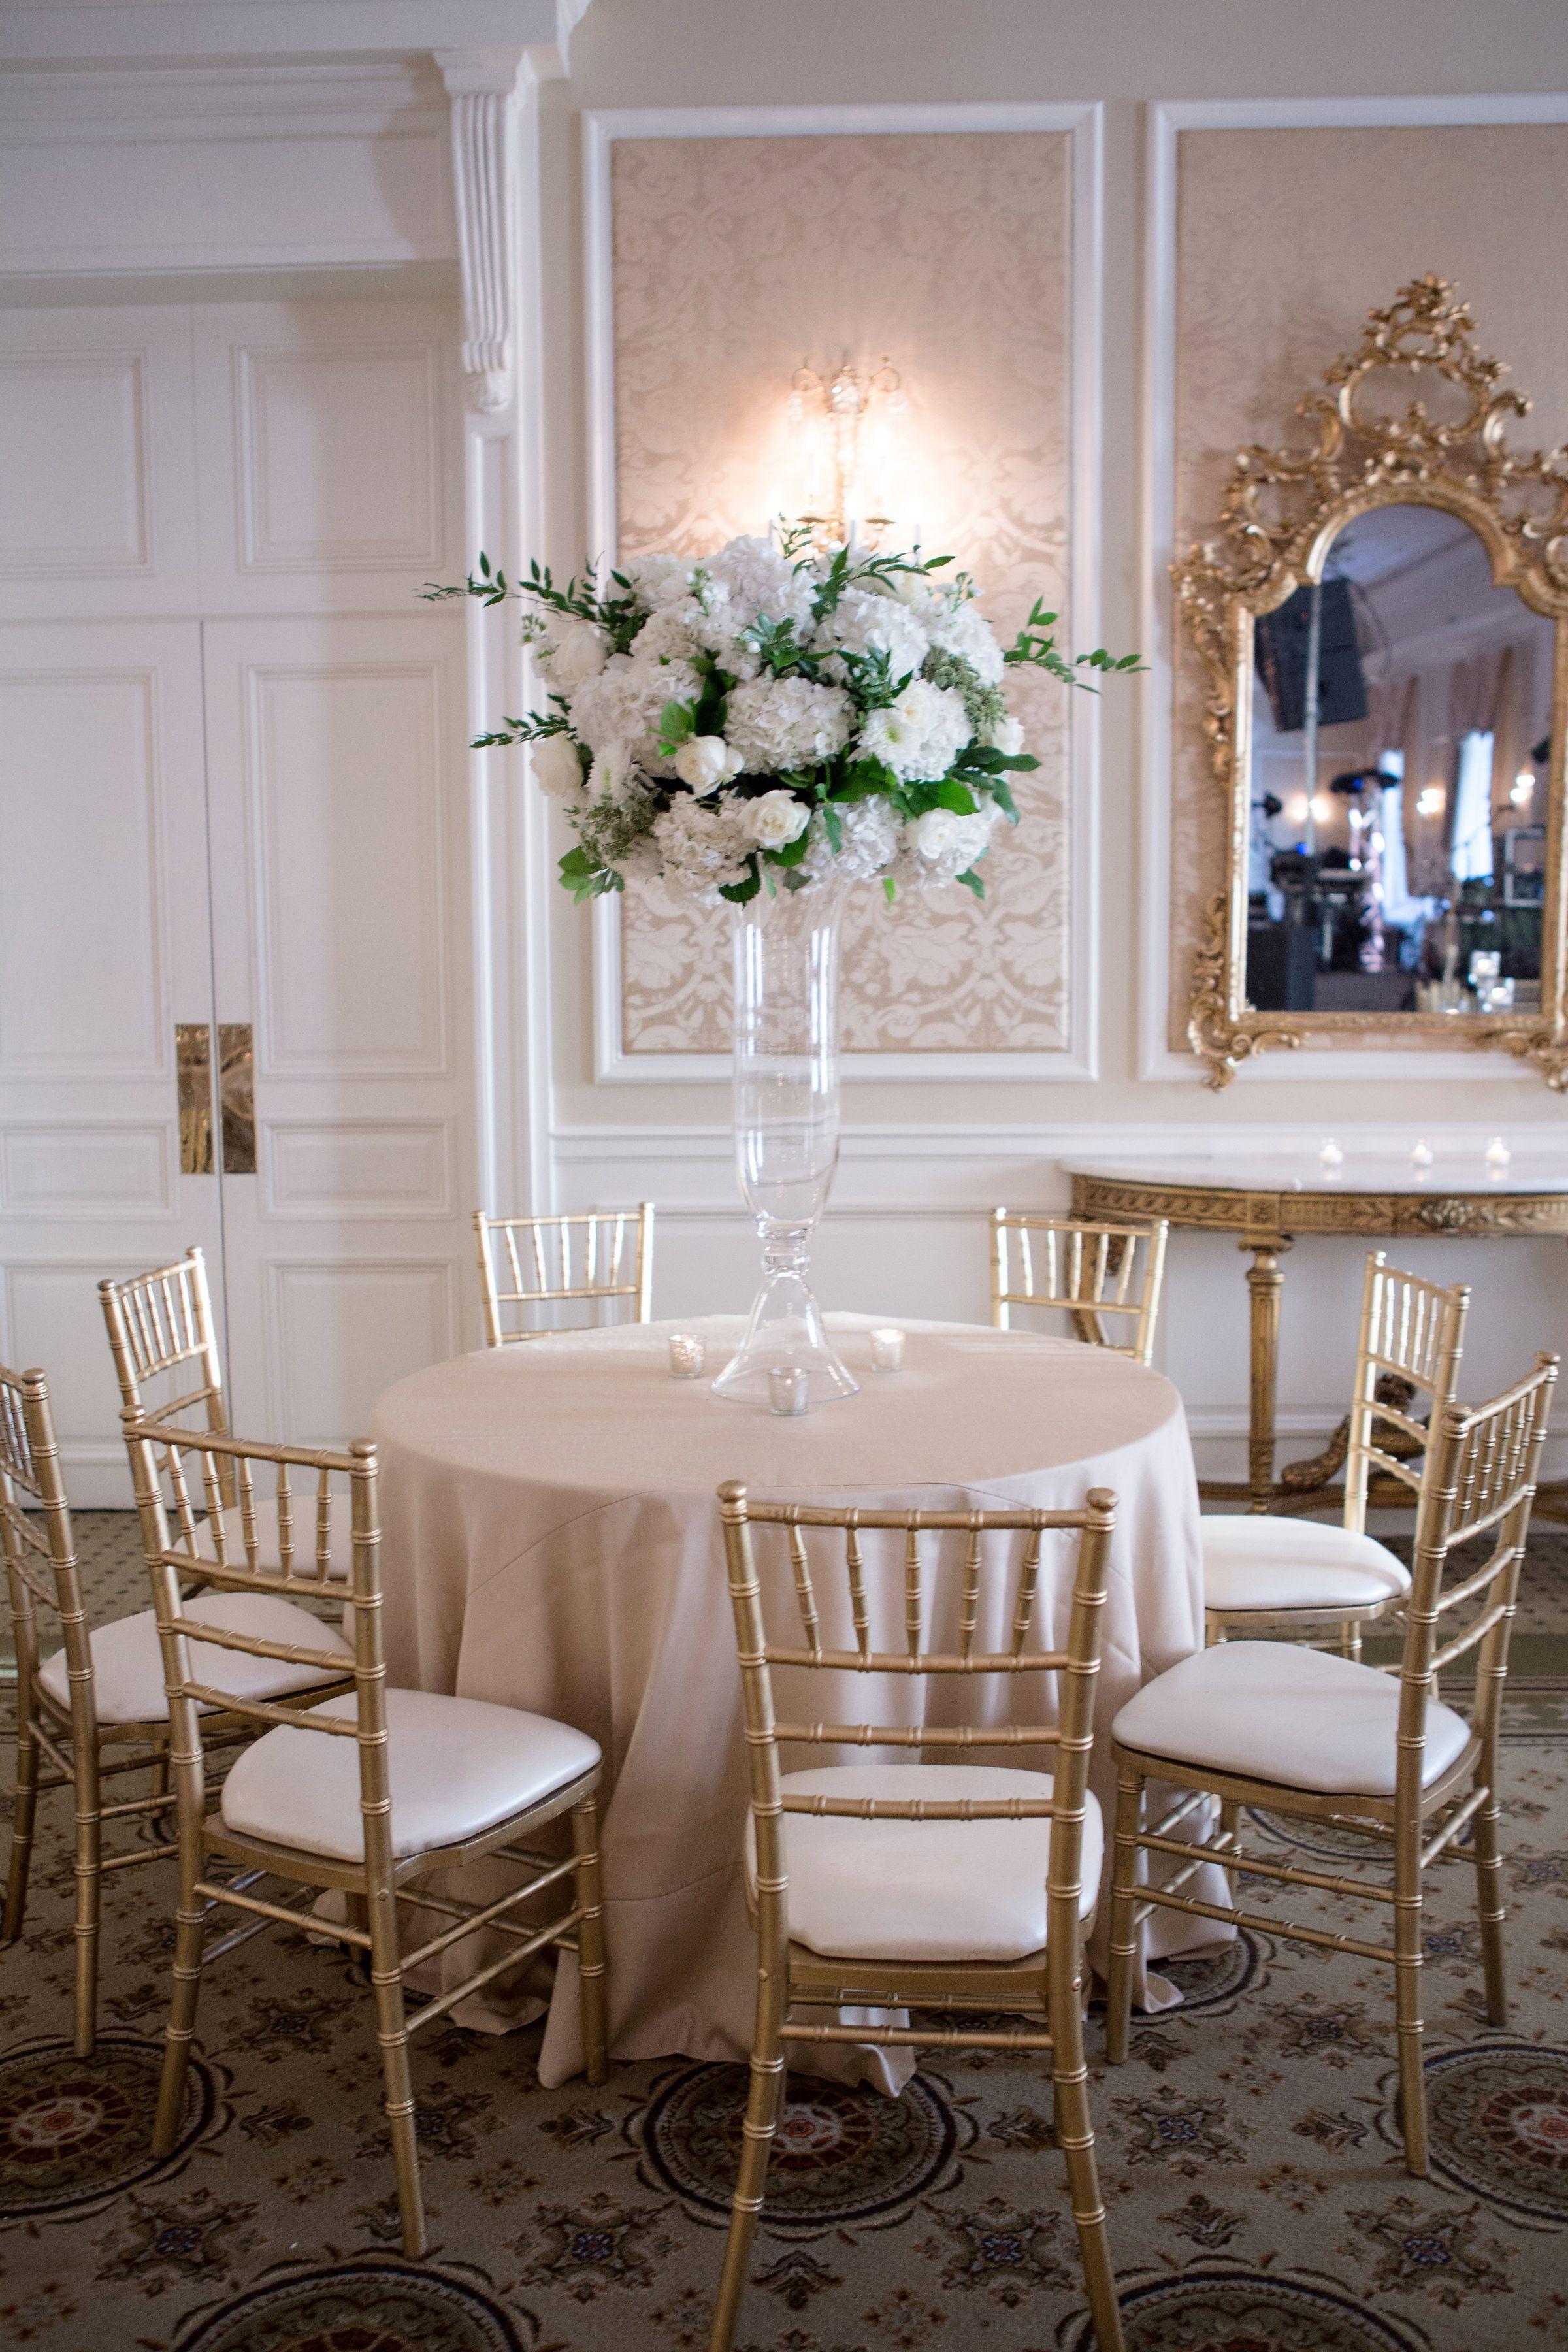 Dramatic Centerpiece With White Roses Lisianthus Ranunculus And Hydrangeas For Lush Winter Weddin Rental Furniture Floral Studio Floral Arrangements Wedding